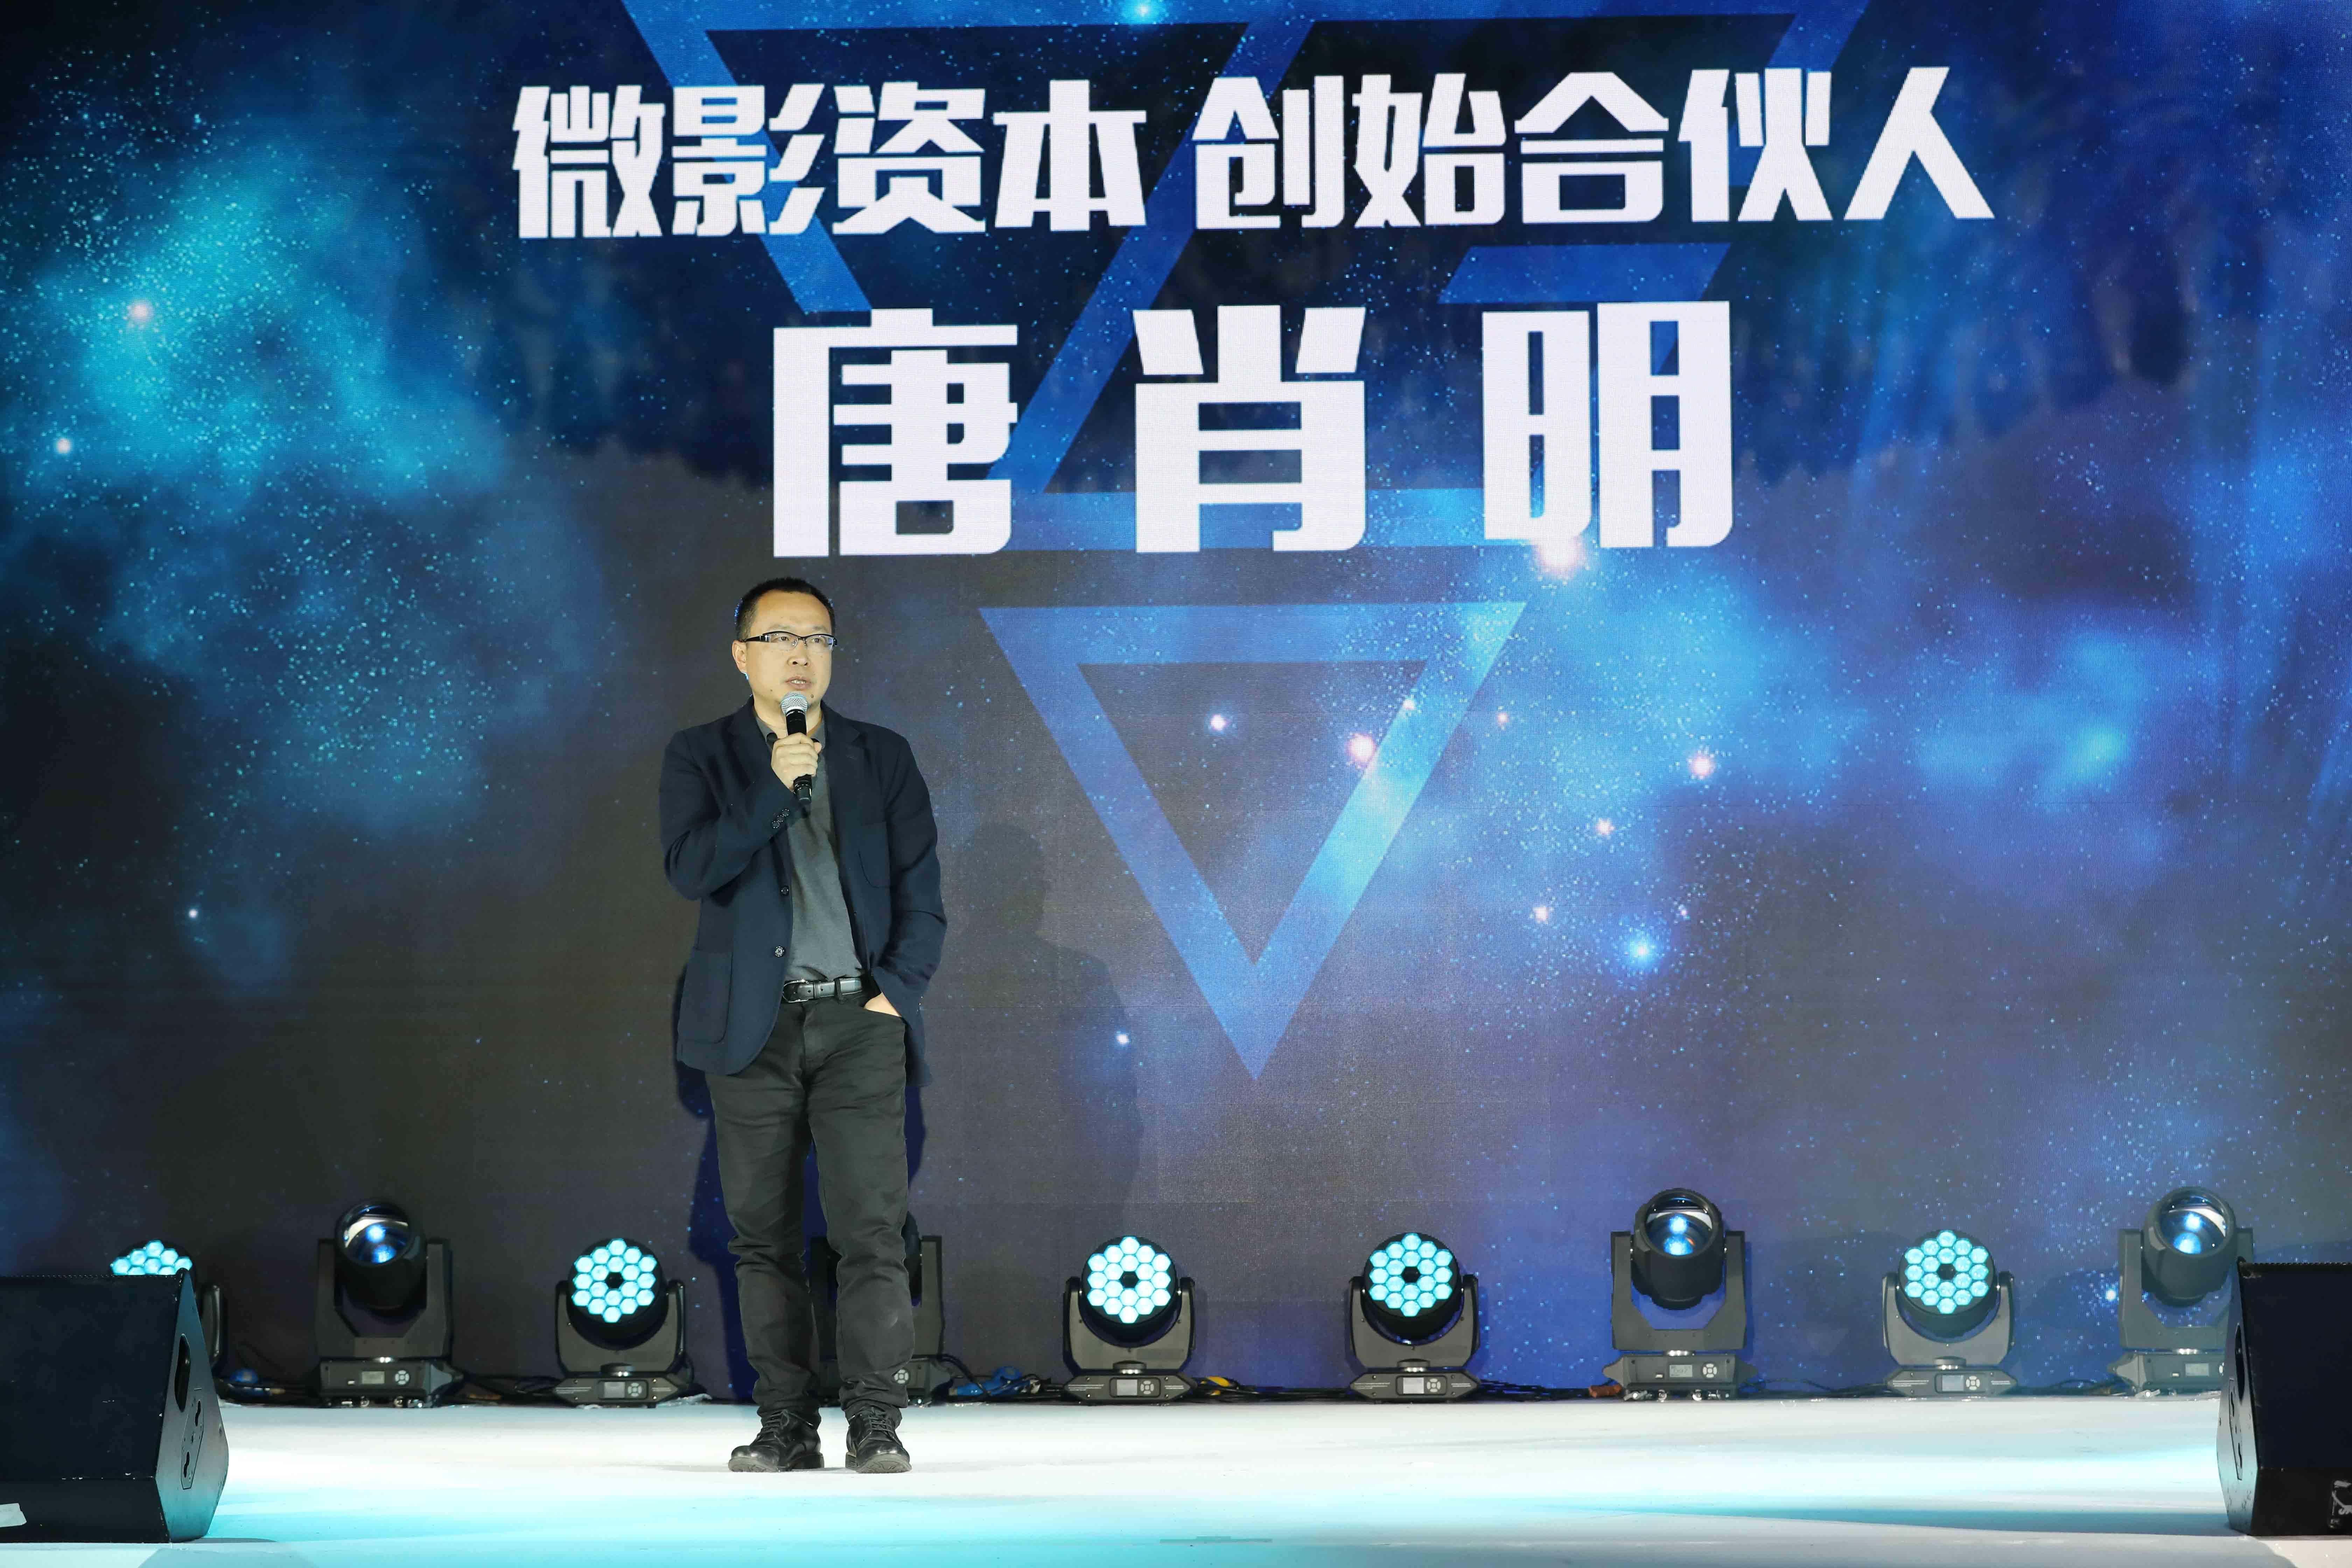 ZERO-G步入2.0时代 副队长伯远爆料签约内幕